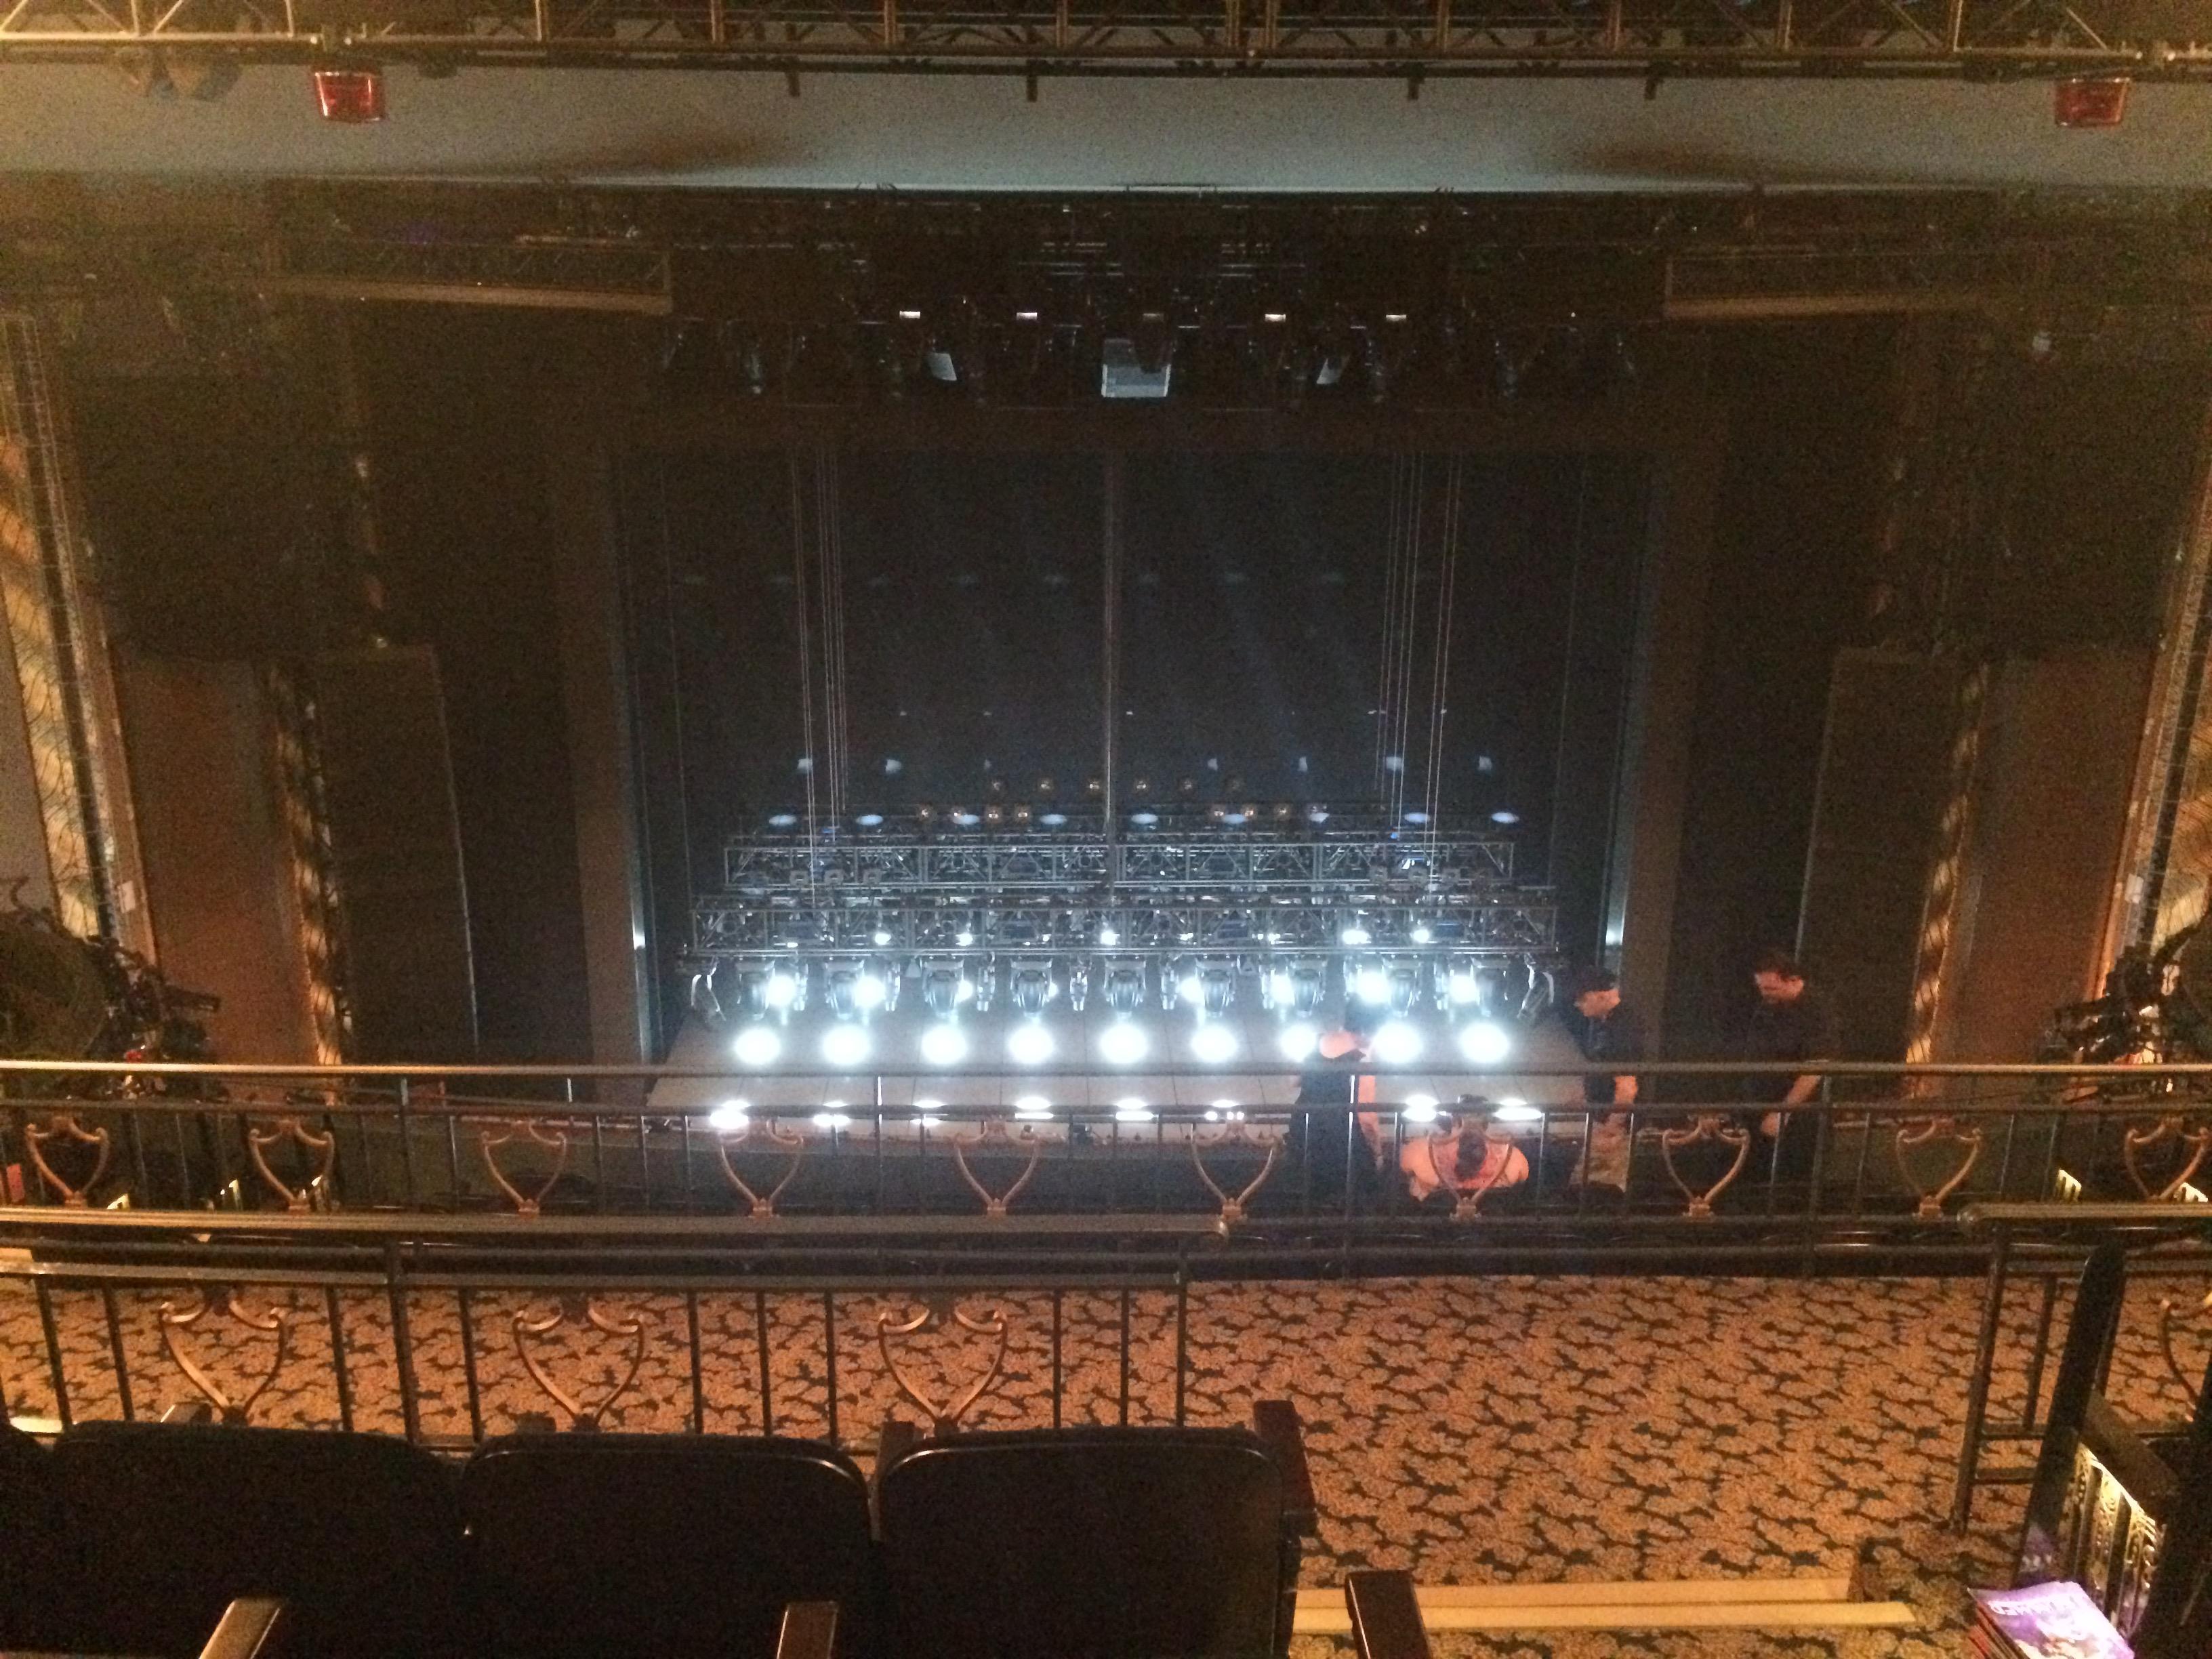 Lunt-Fontanne Theatre Section Rear Mezzanine LC Row D Seat 101